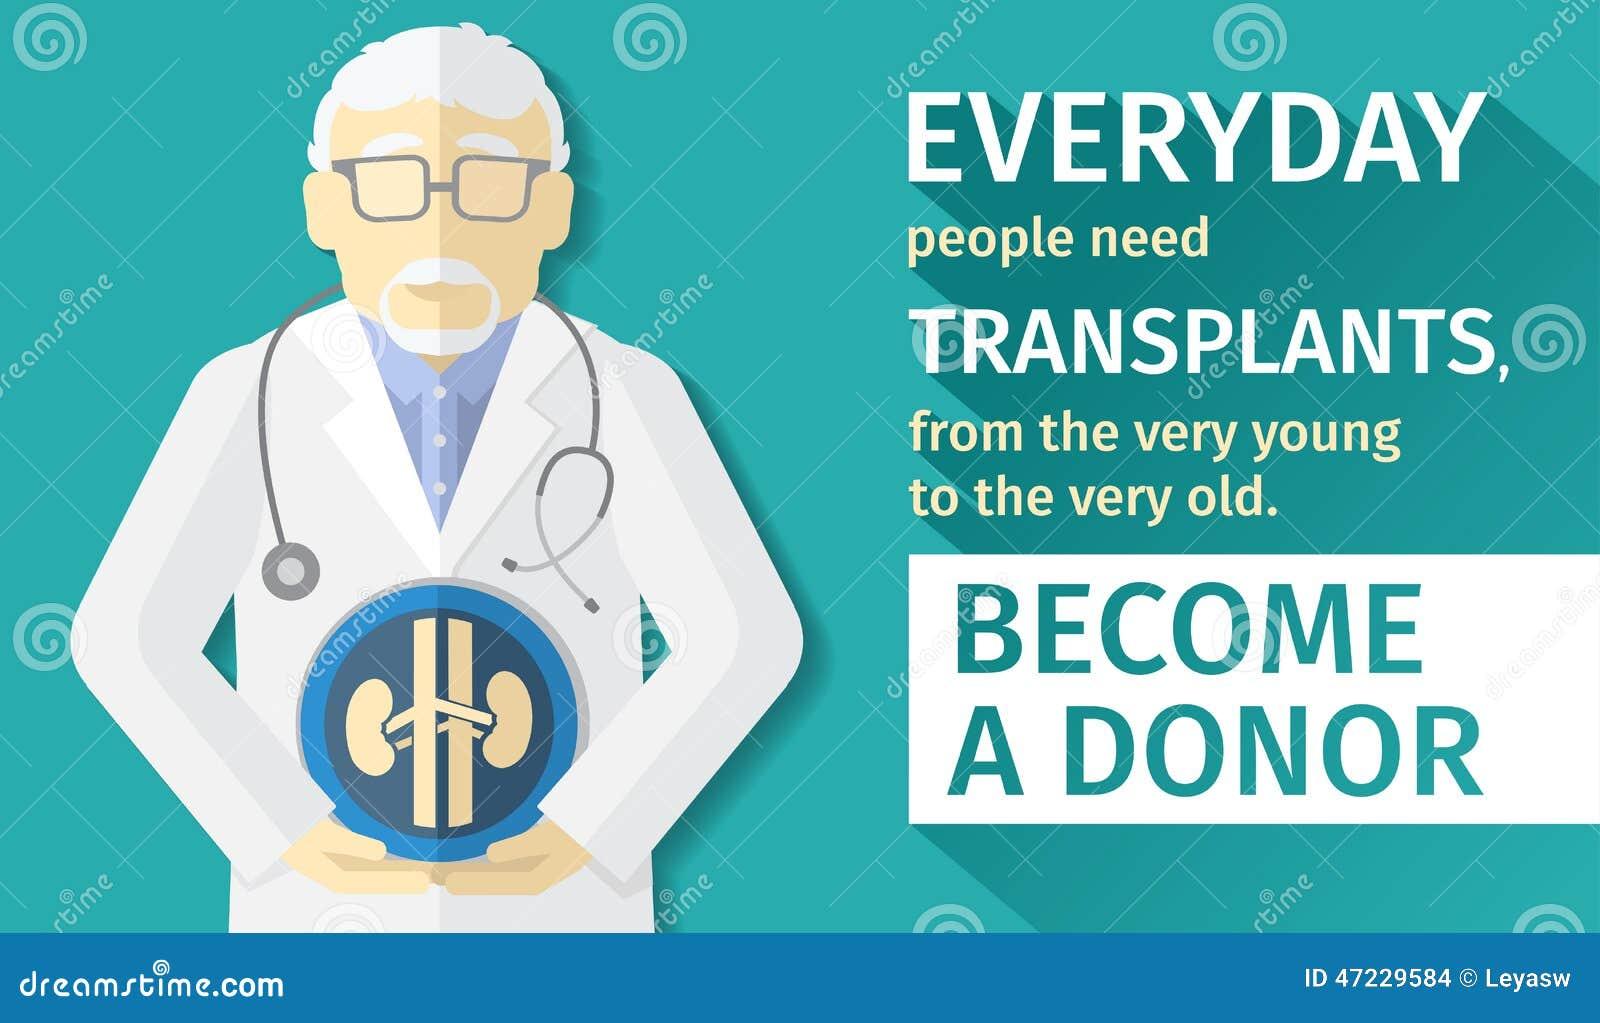 is hf s donor stock sale program a good idea